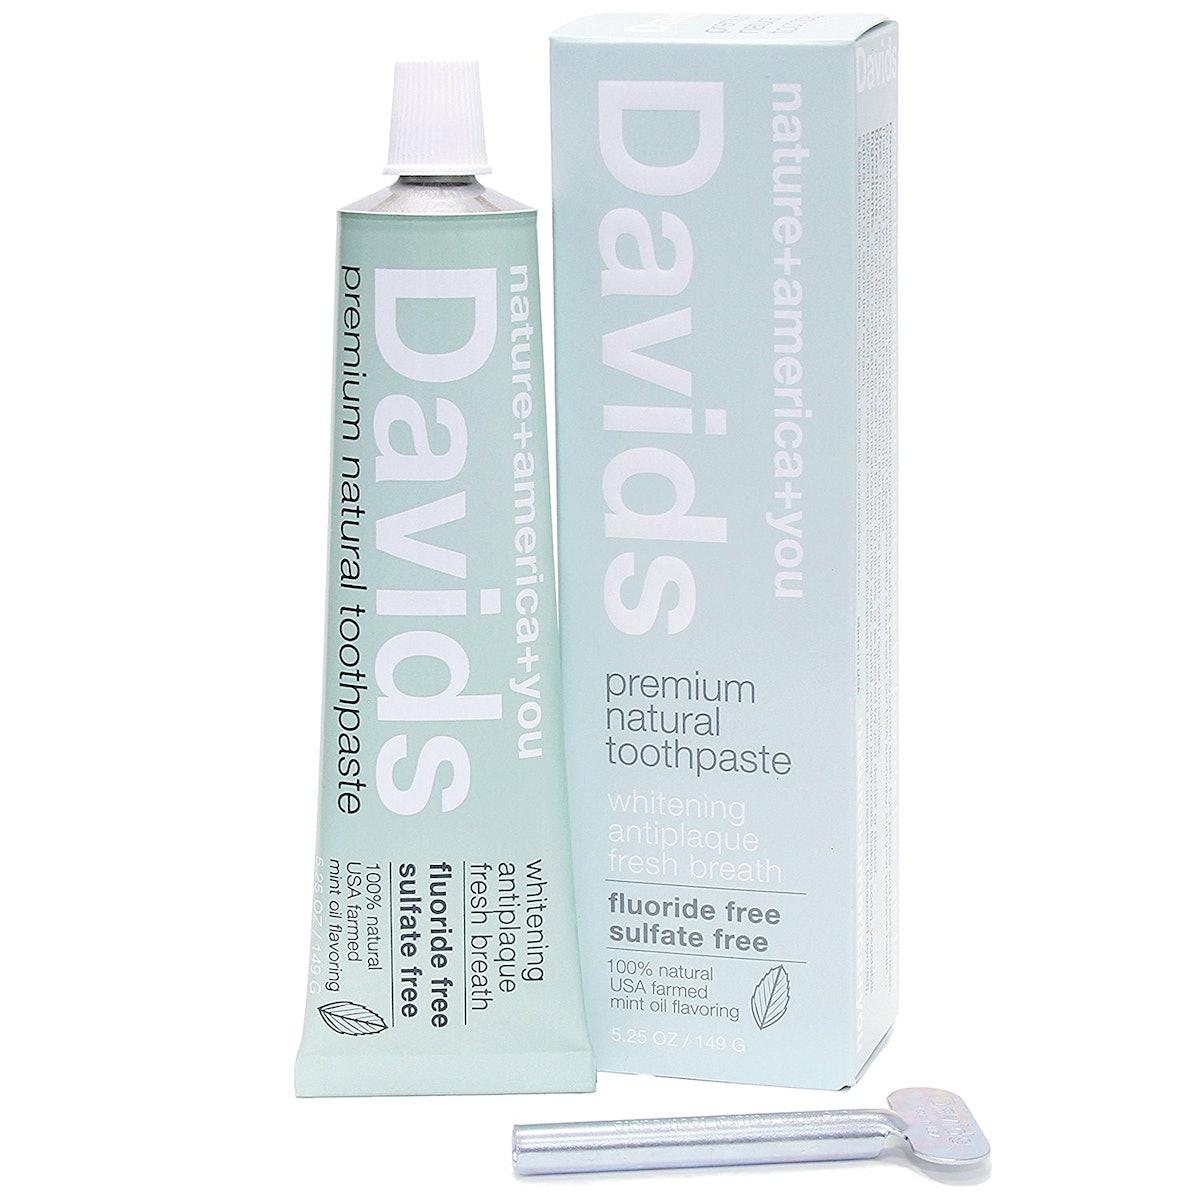 Davids Natural Toothpaste